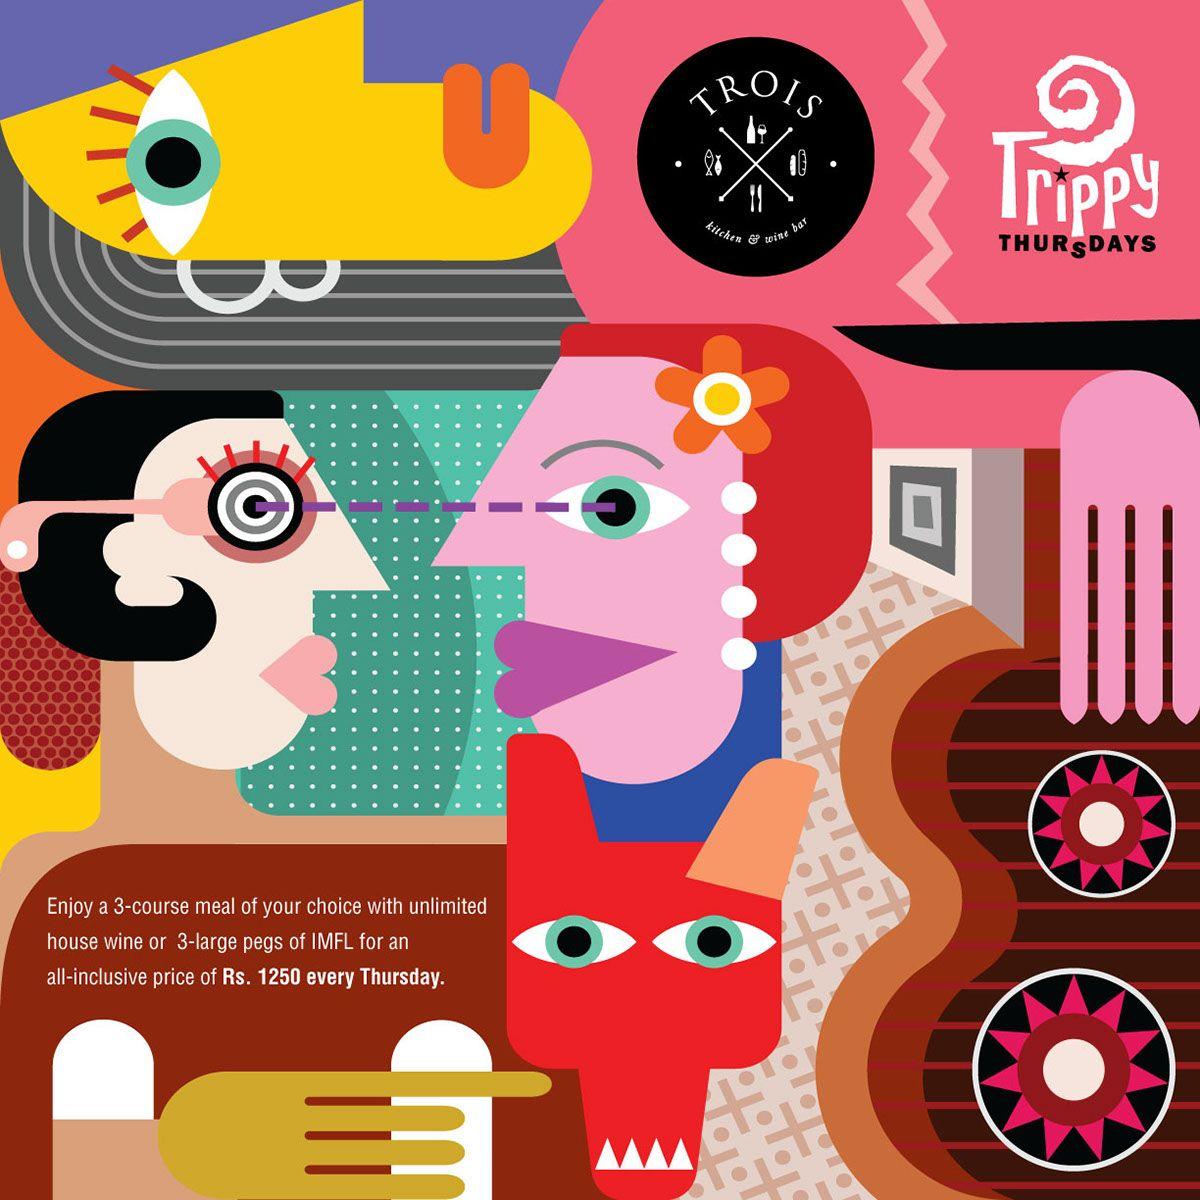 Trois Trippy Thursday On Behance Illustration Free Vector Art Creative Market